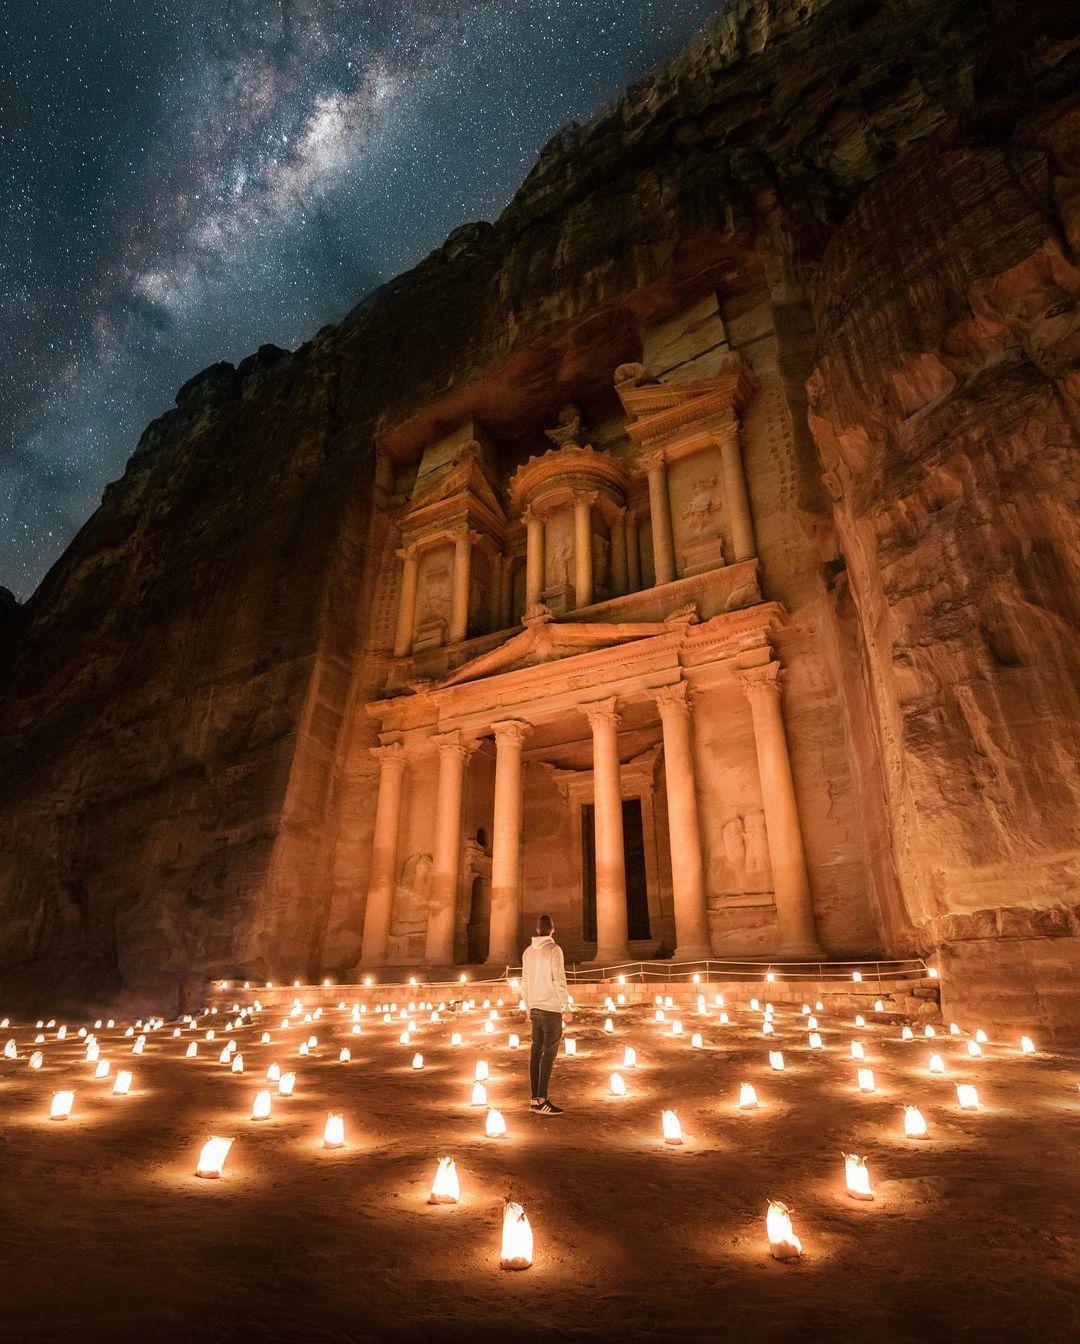 Впечатляющие снимки из путешествий Тима Филиппуса